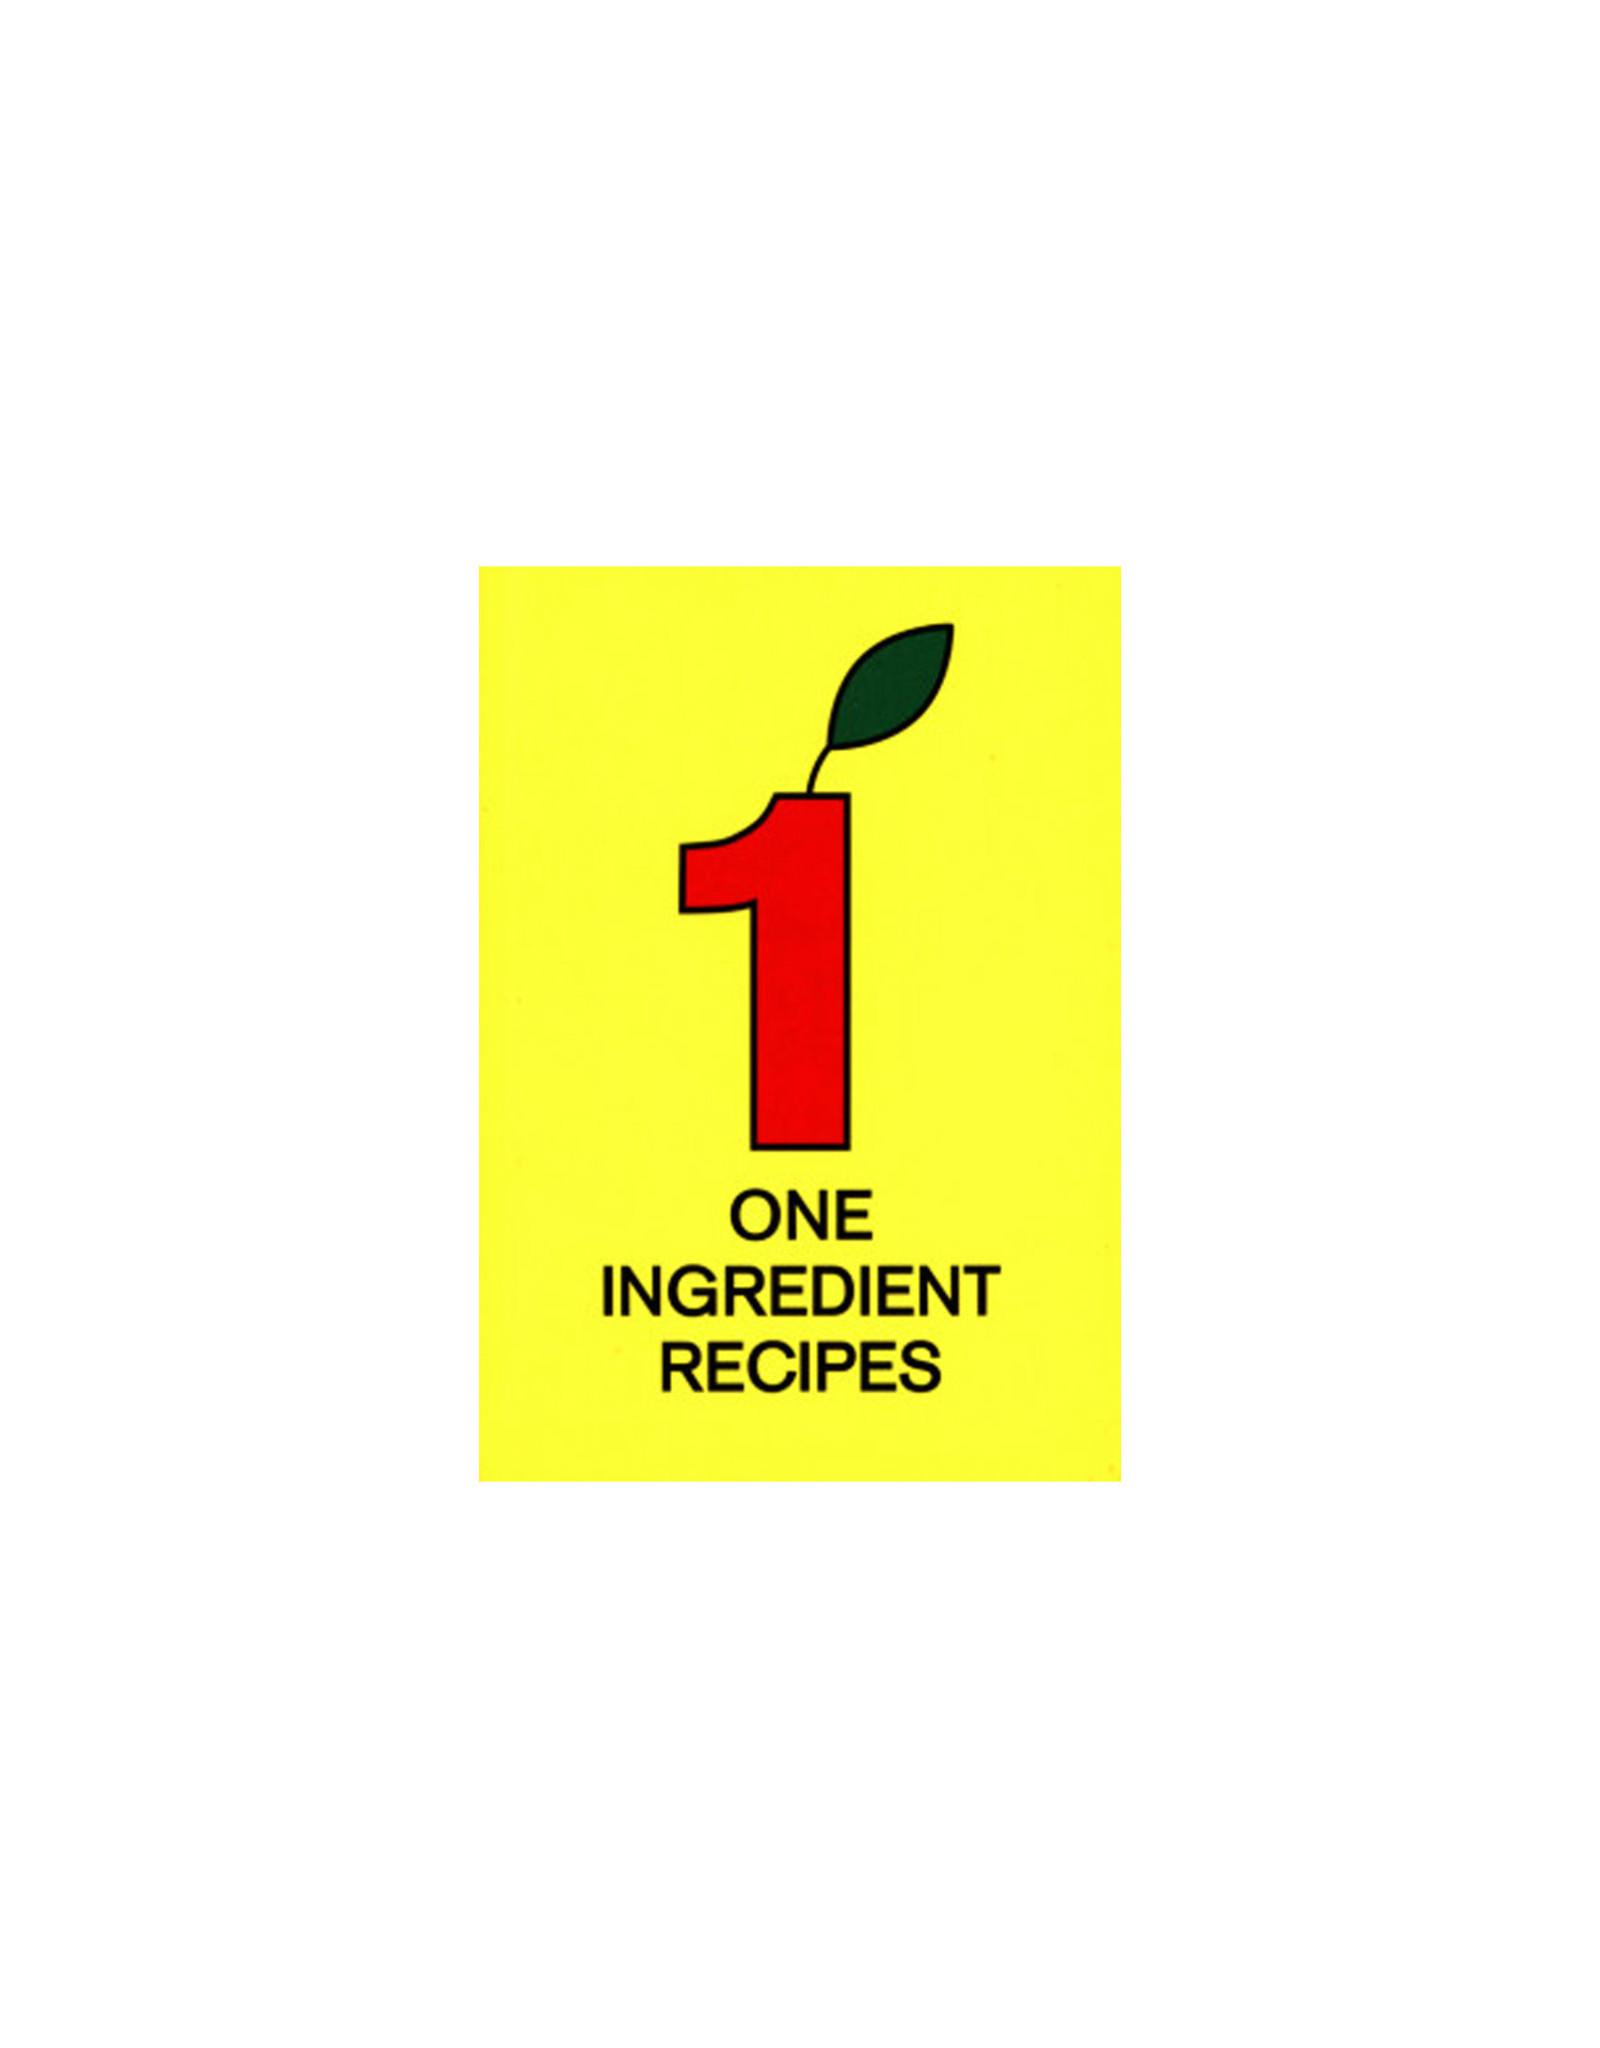 Martijn In 't Veld - One Ingredient Recipes